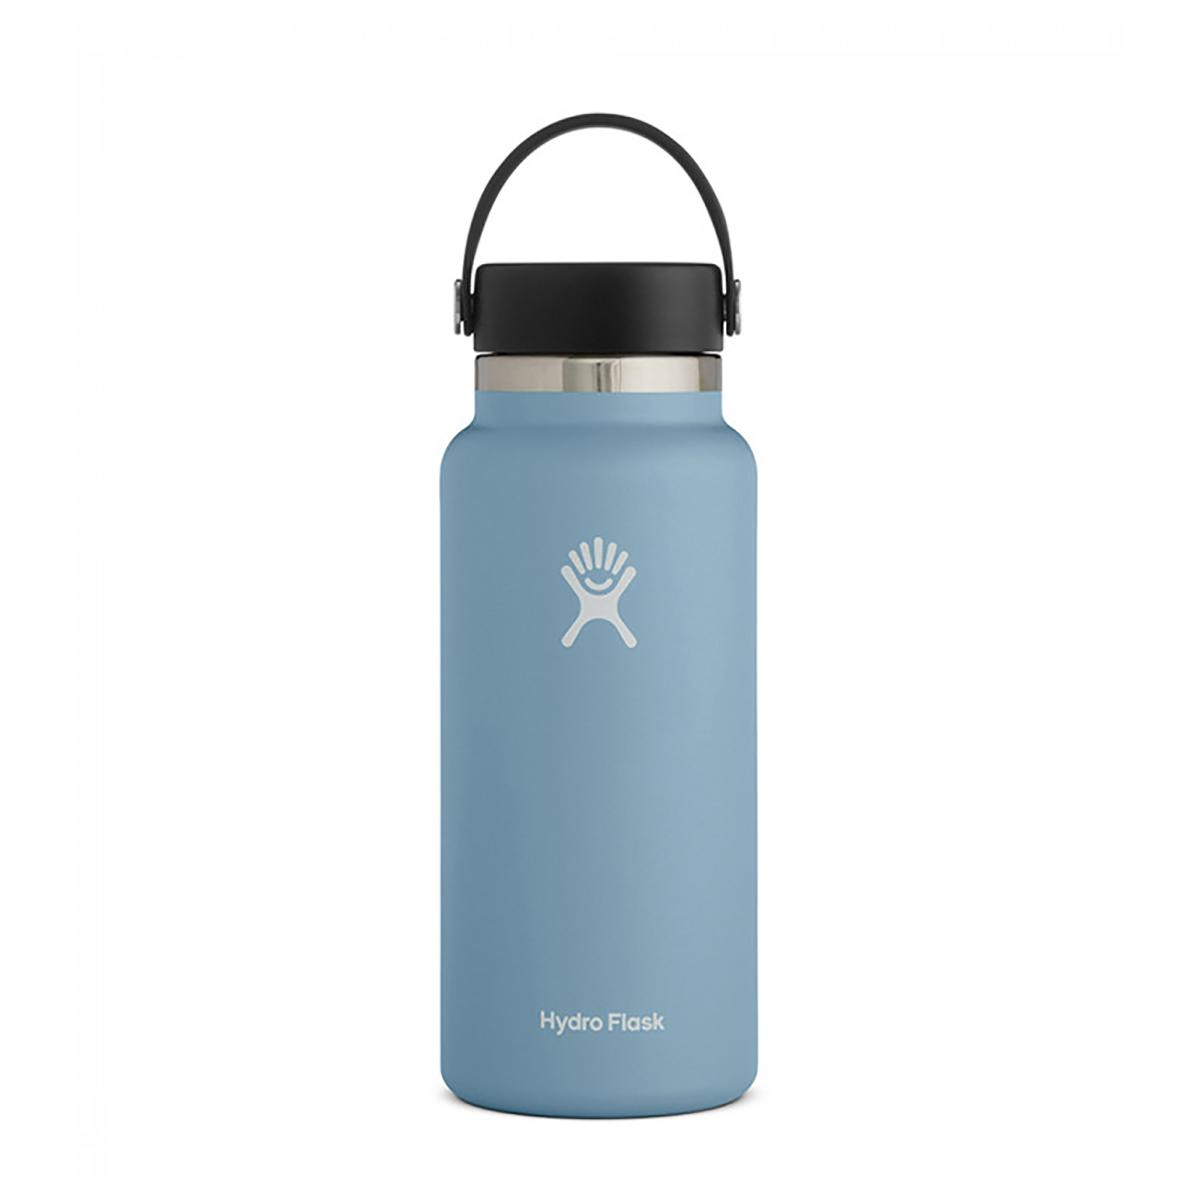 Hydro Flask 32 oz Wide Mouth Water Bottle - Color: Rain, Rain, large, image 1